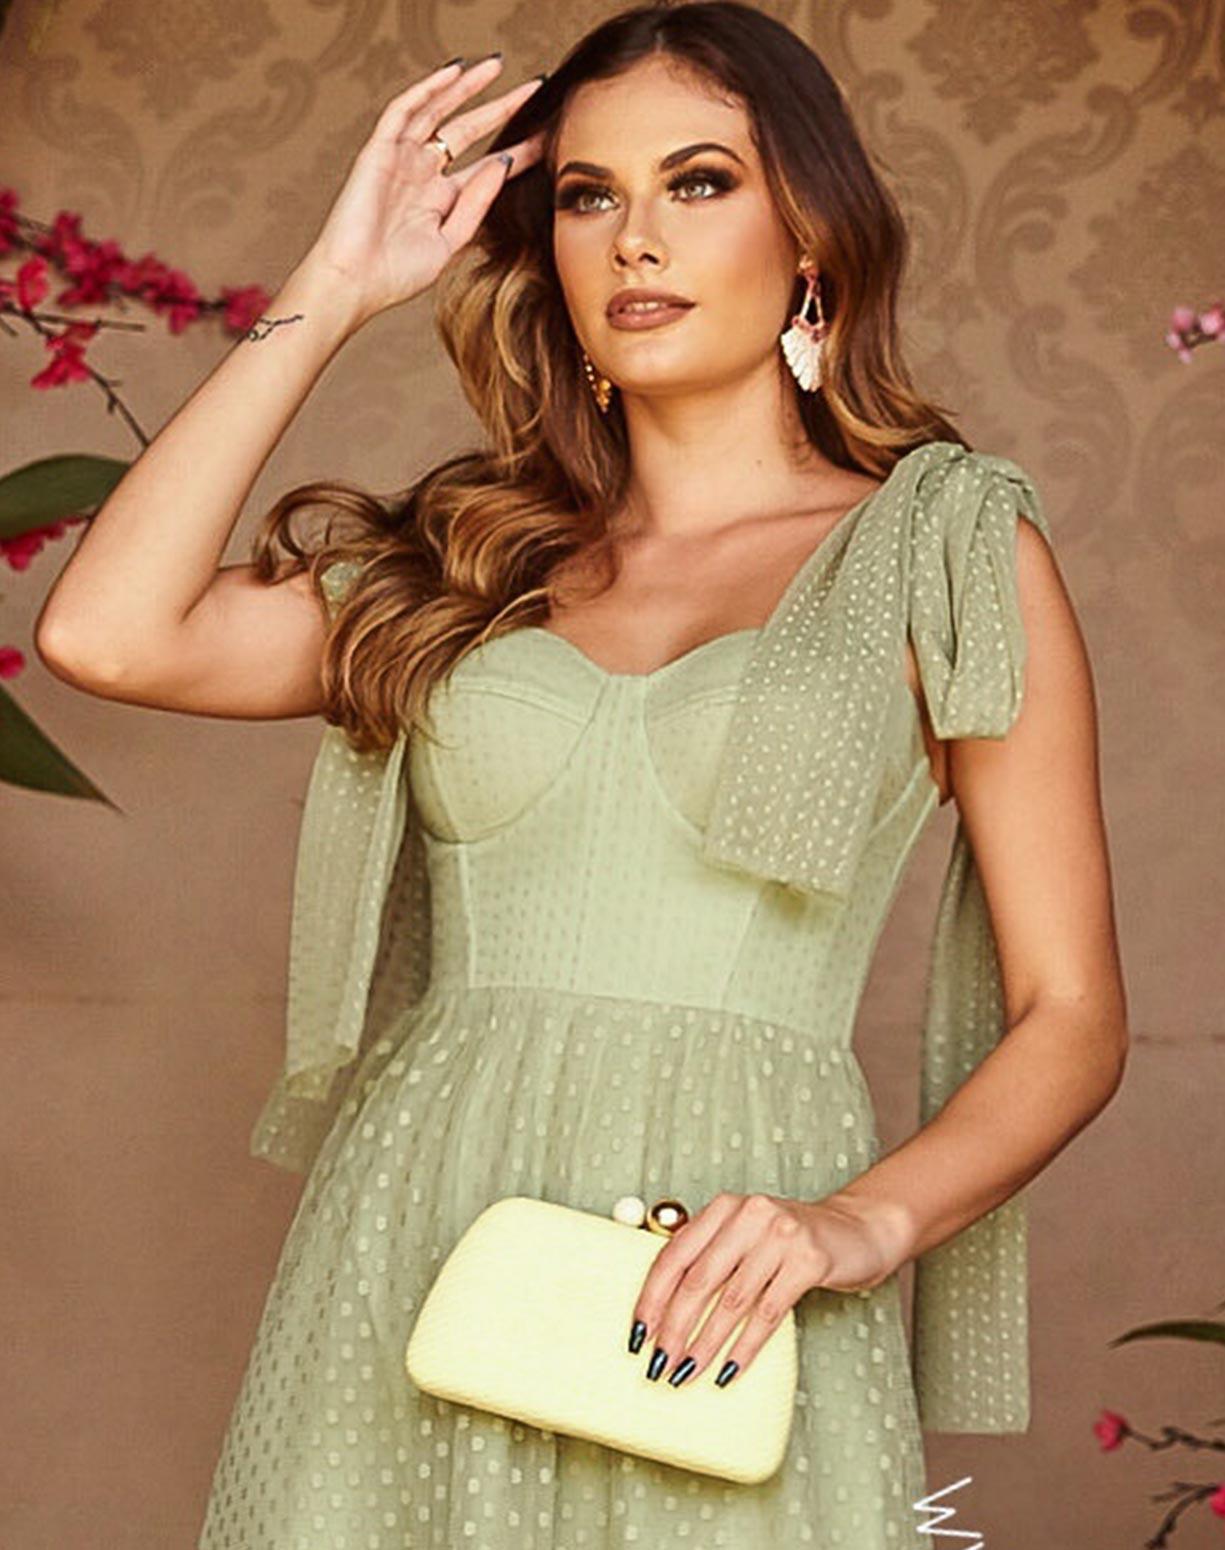 Vestido Midi Verde pistache com Textura em Mini Poás